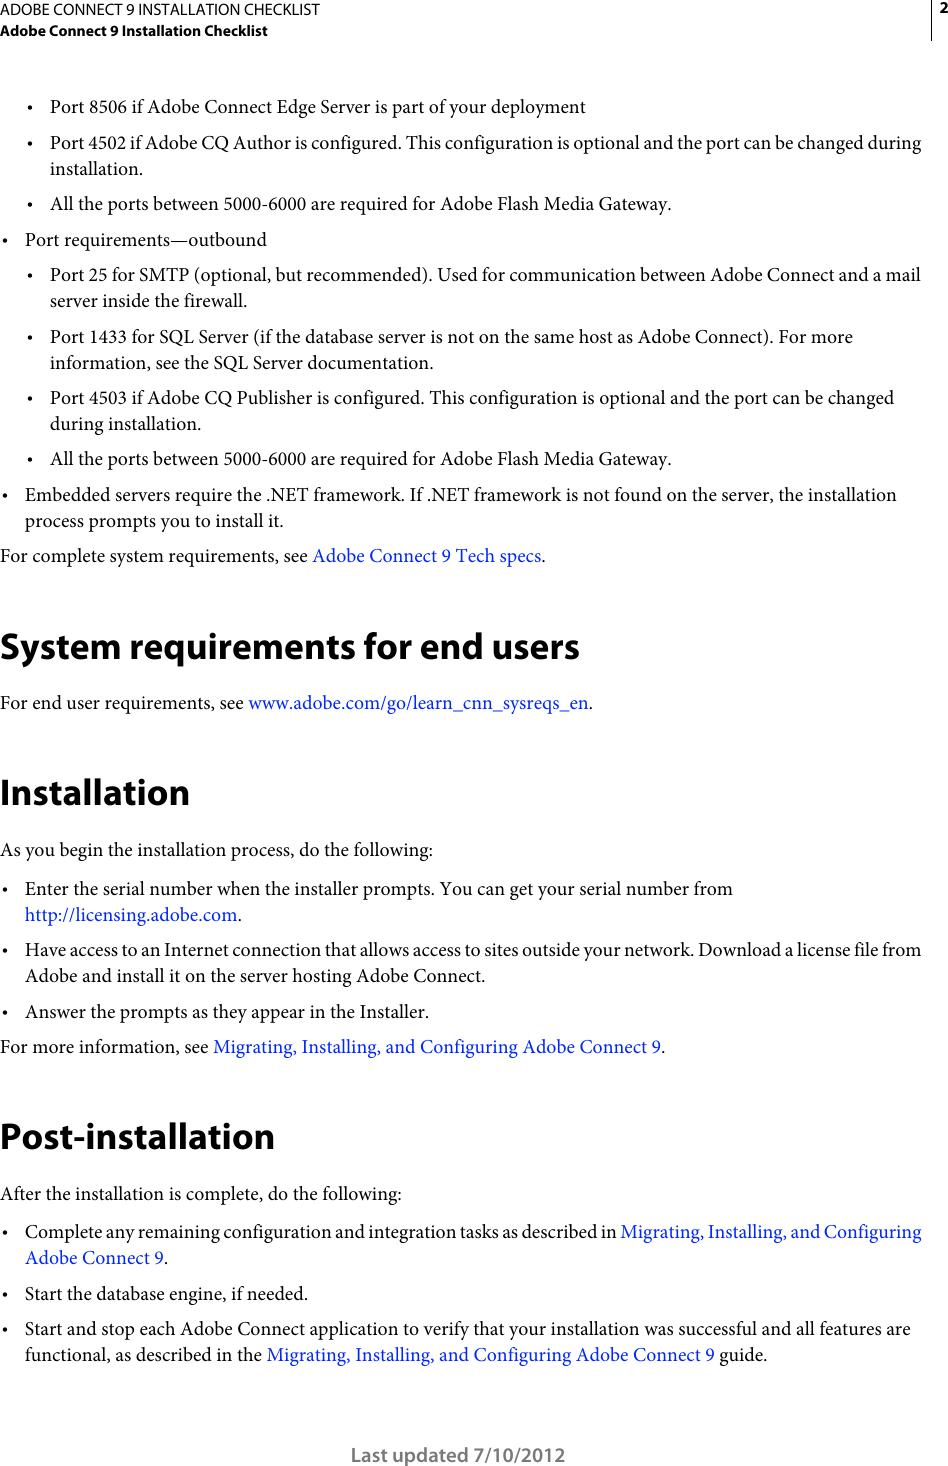 Adobe Connect 9 Installation Checklist 9 0 Install En